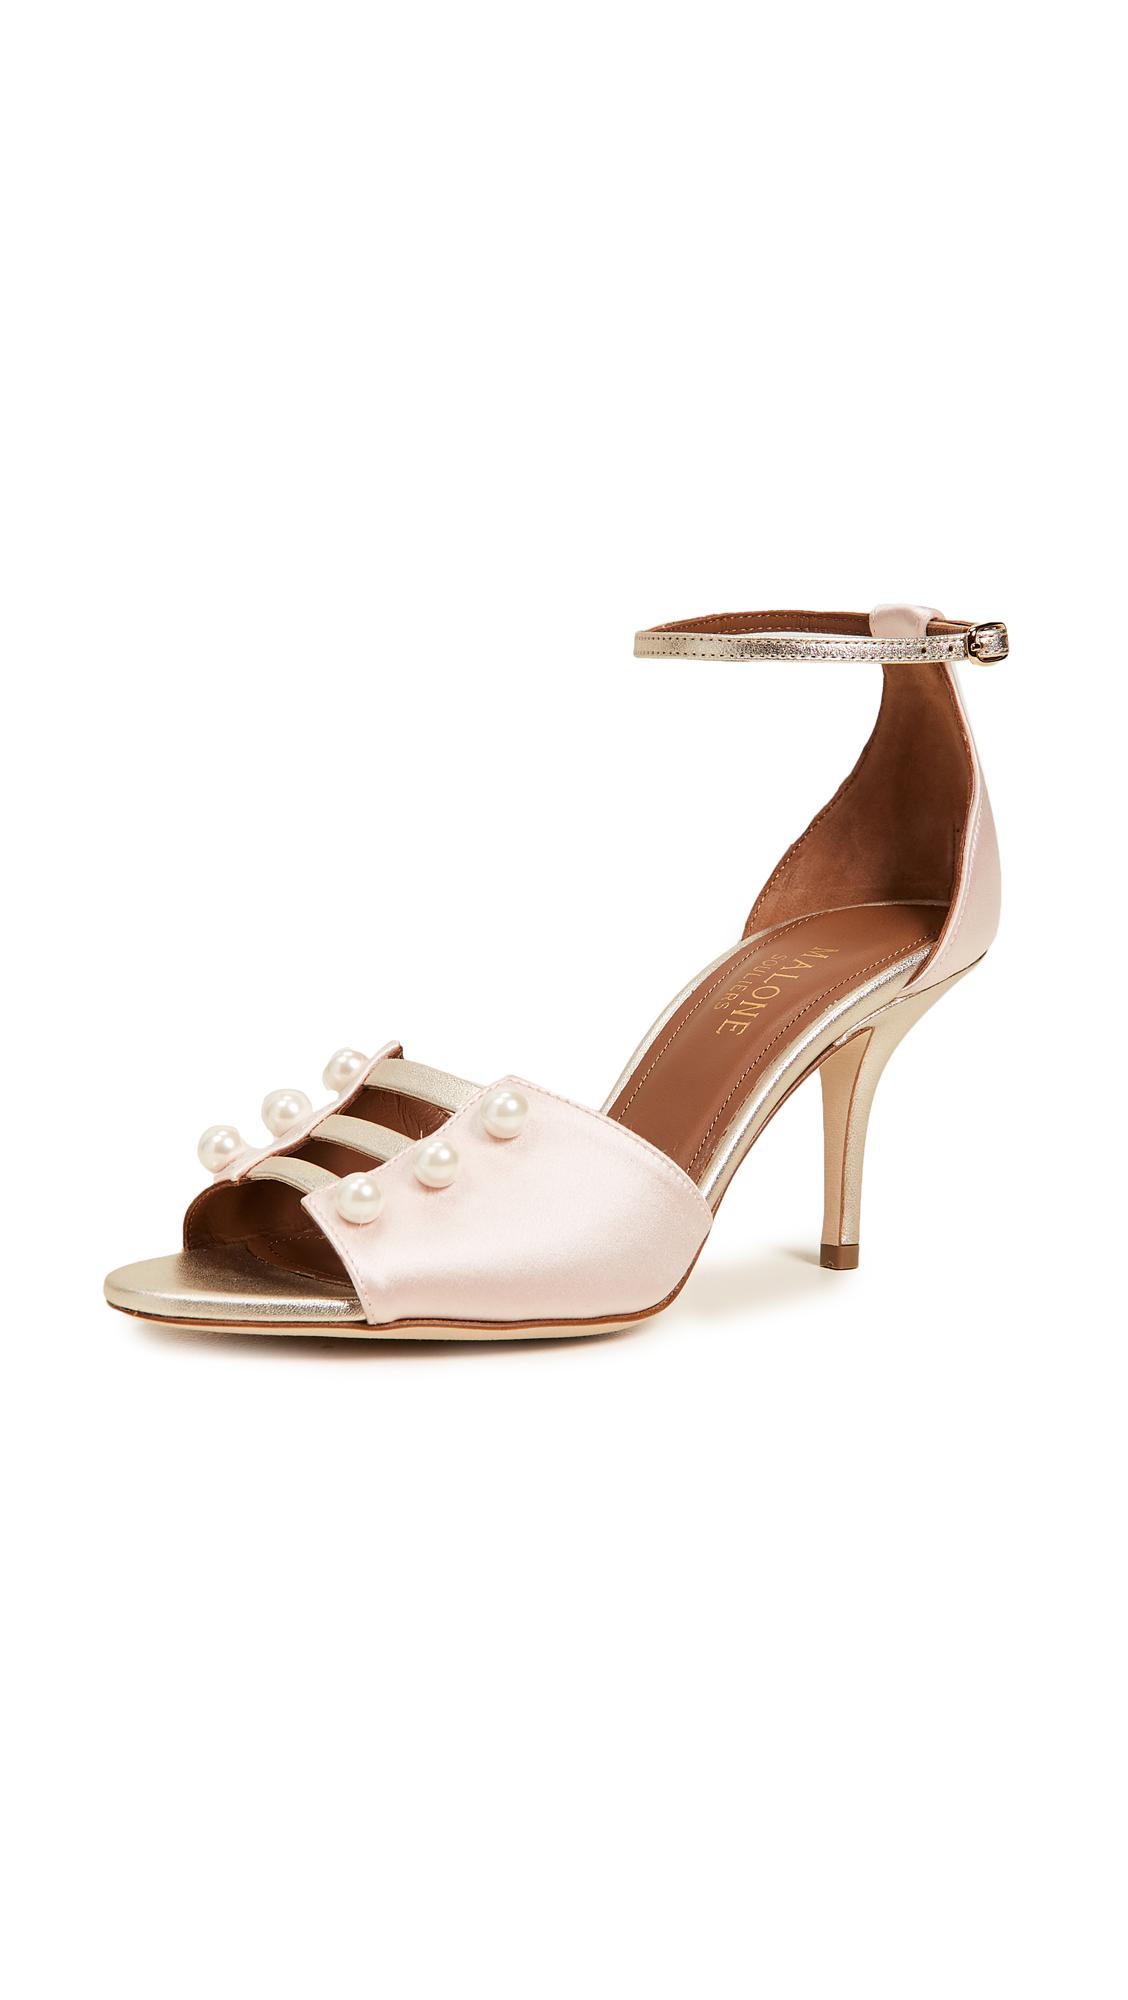 Malone Souliers Zuzu 70mm Sandals - Rose/Platino